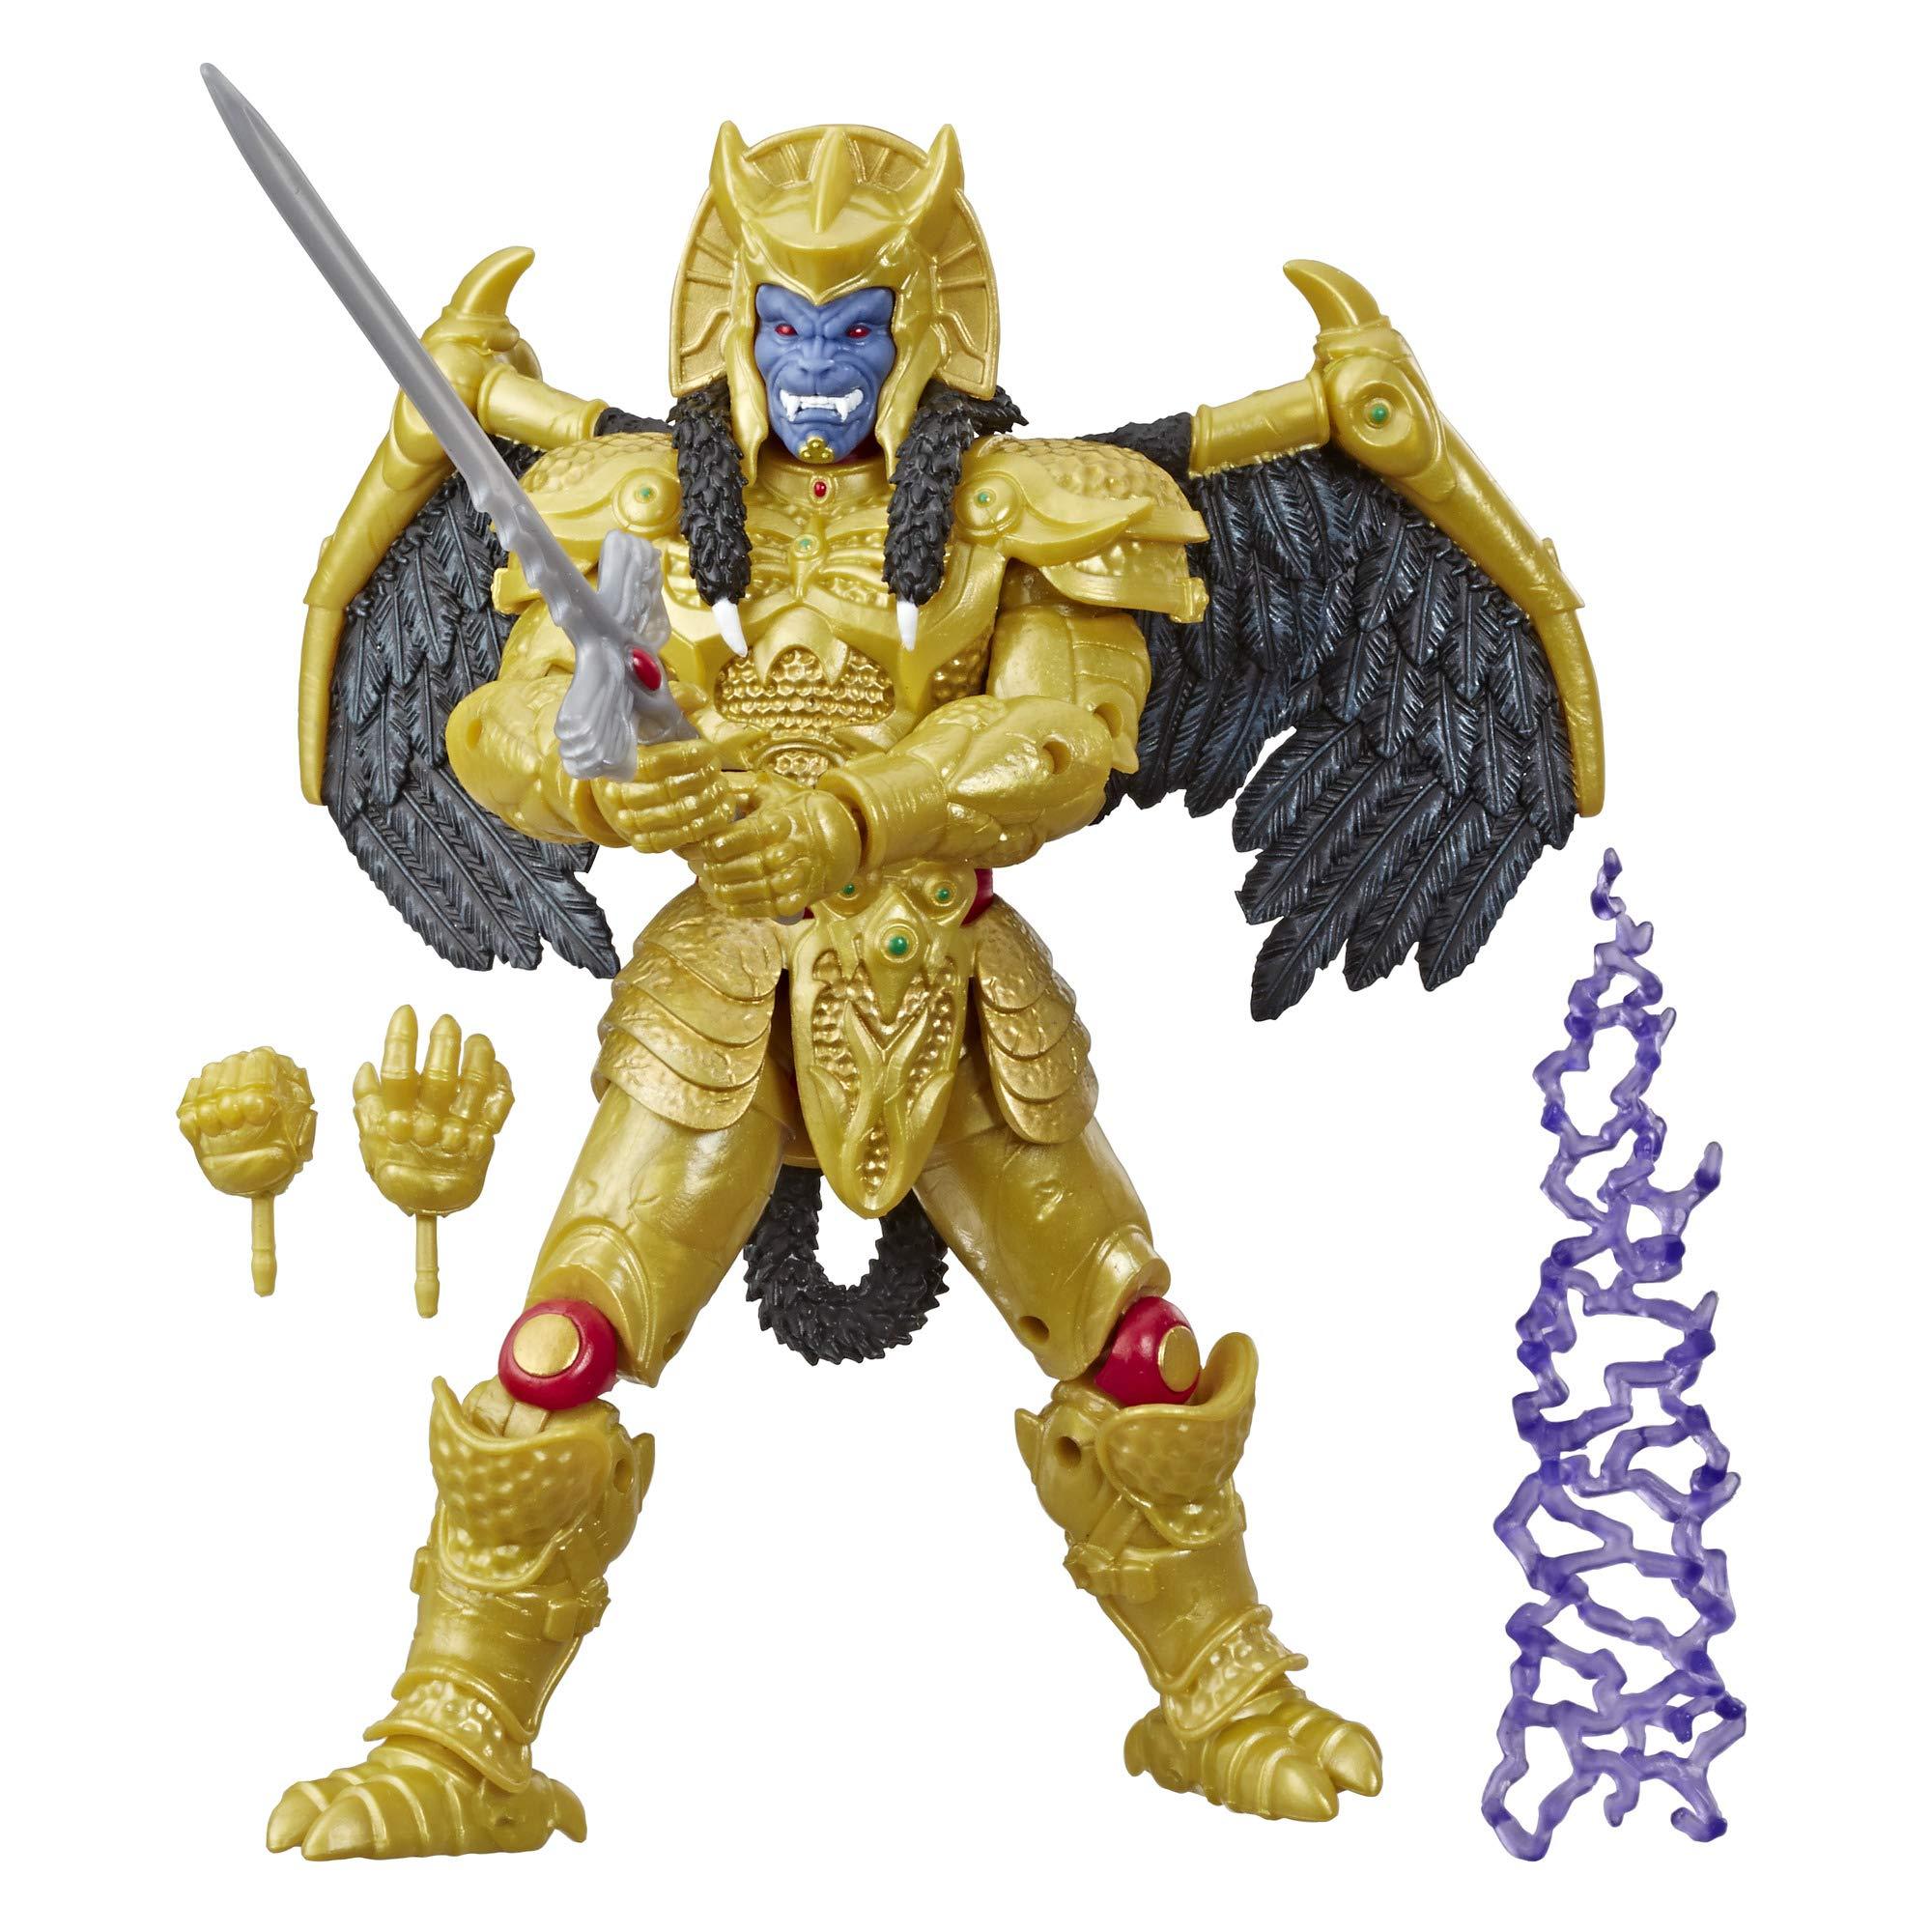 Power Rangers Saban's Lighting Collection Goldar